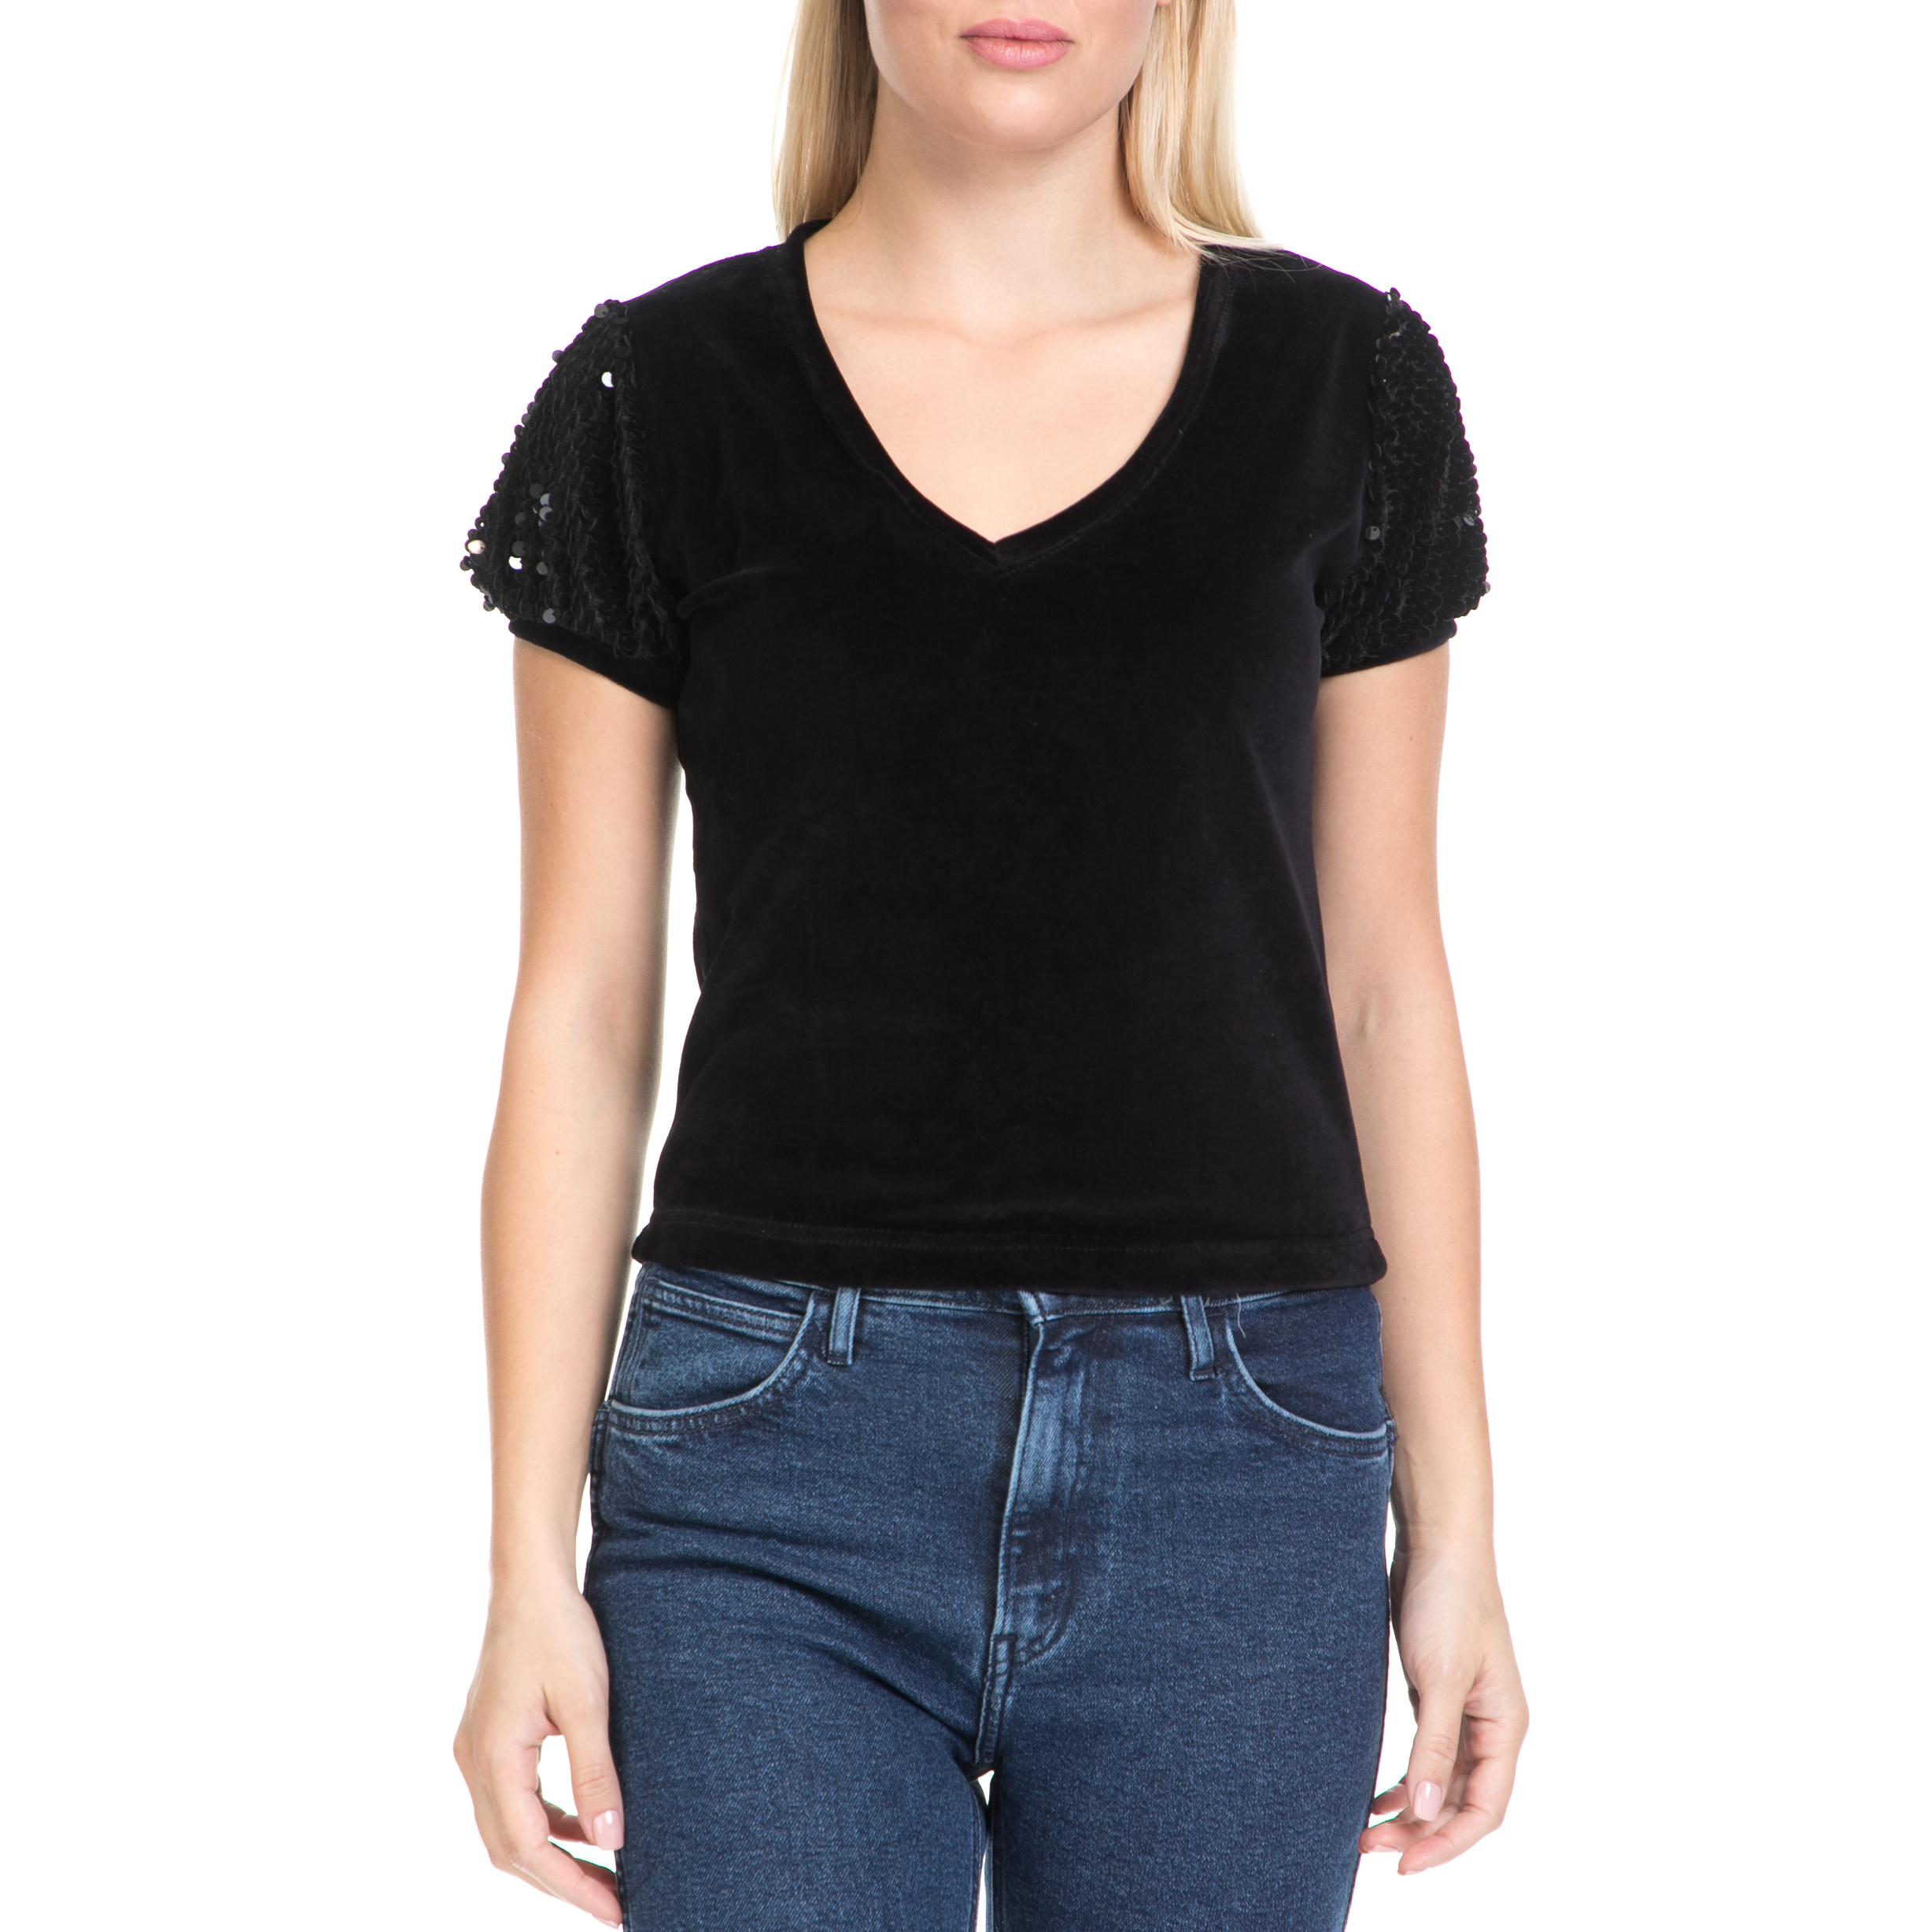 MYMOO – Γυναικεία μπλούζα MYMOO μαύρη